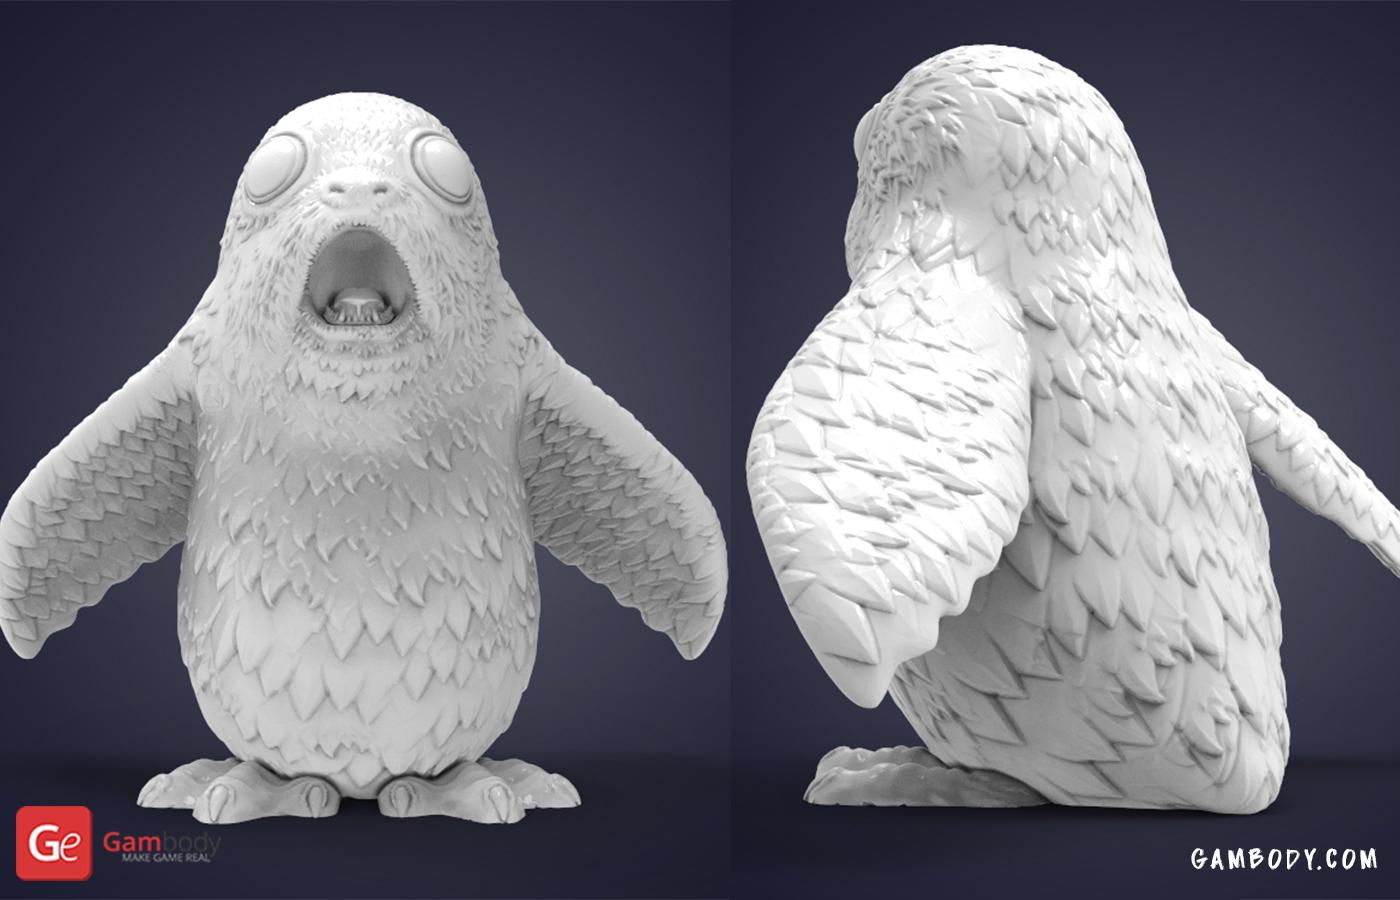 Impressed Porg 3D Printing Figurine